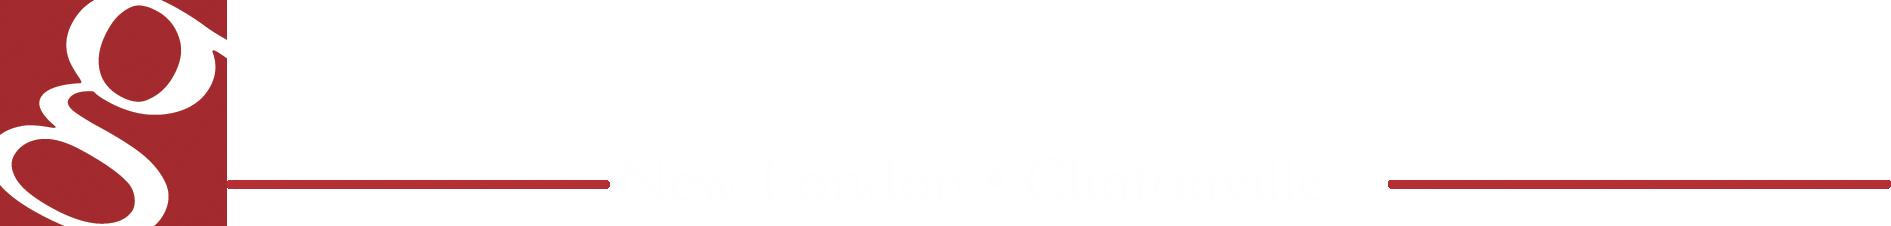 Griebenow Eyecare, S.C. Logo